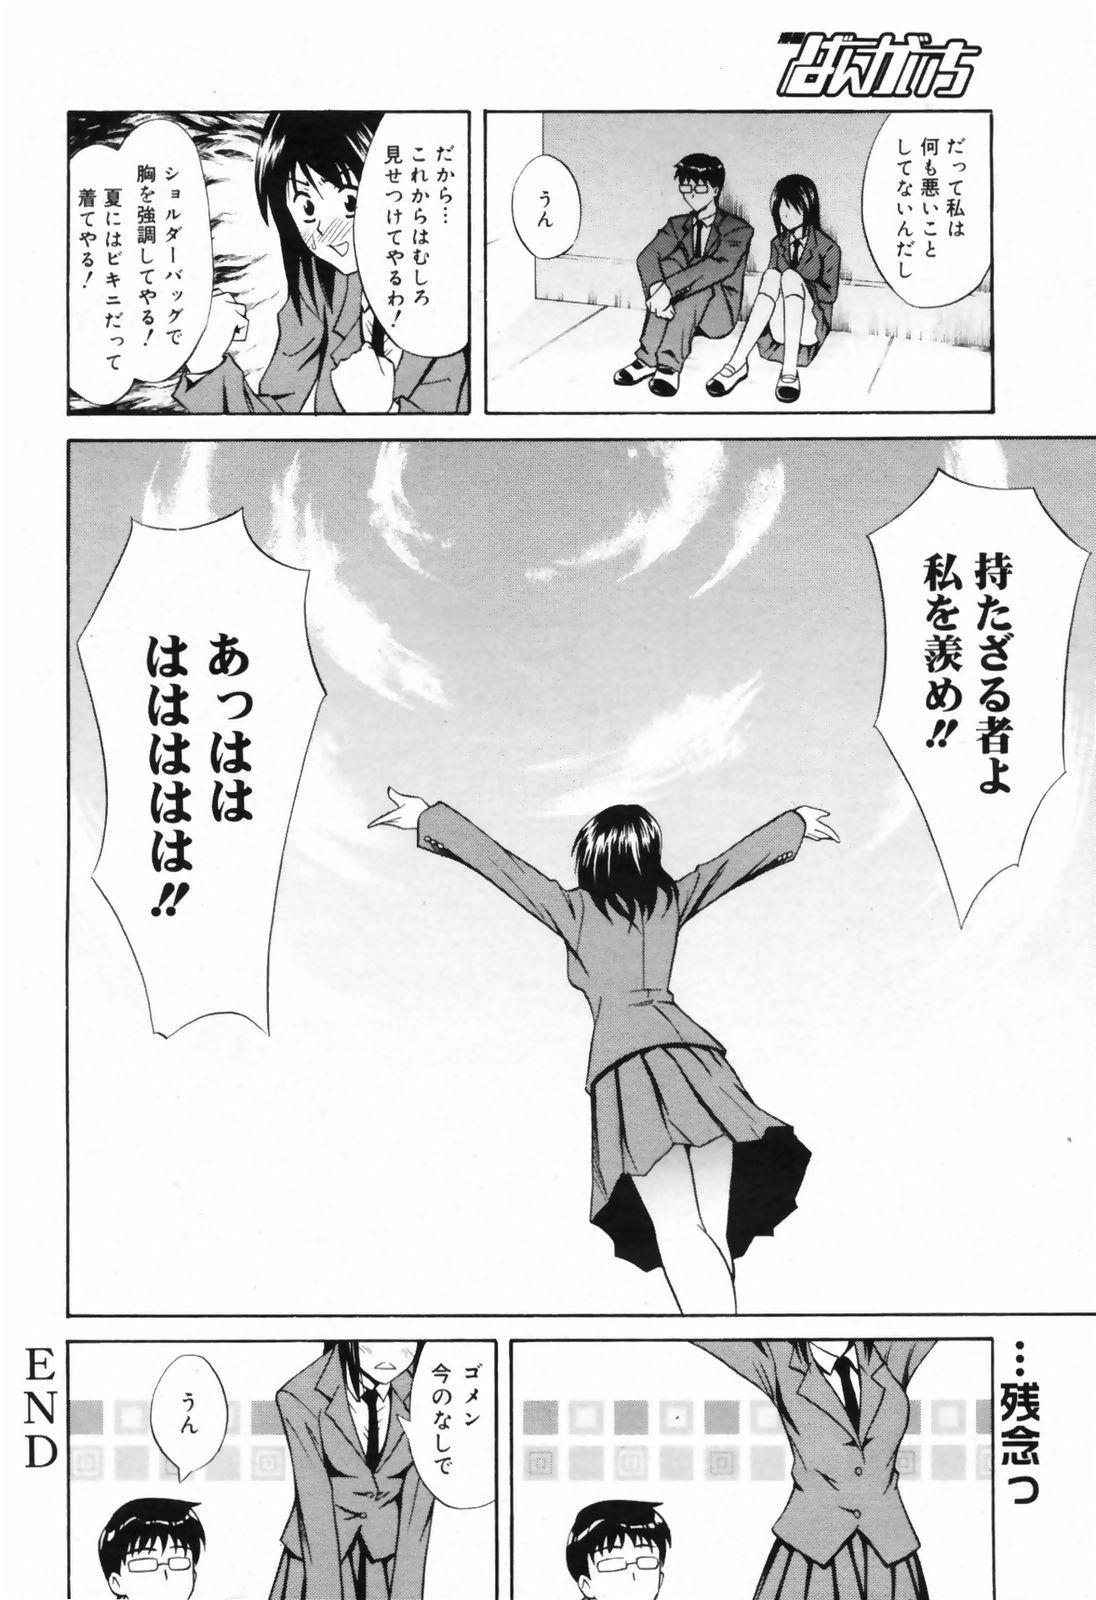 Manga Bangaichi 2009-02 Vol. 234 199